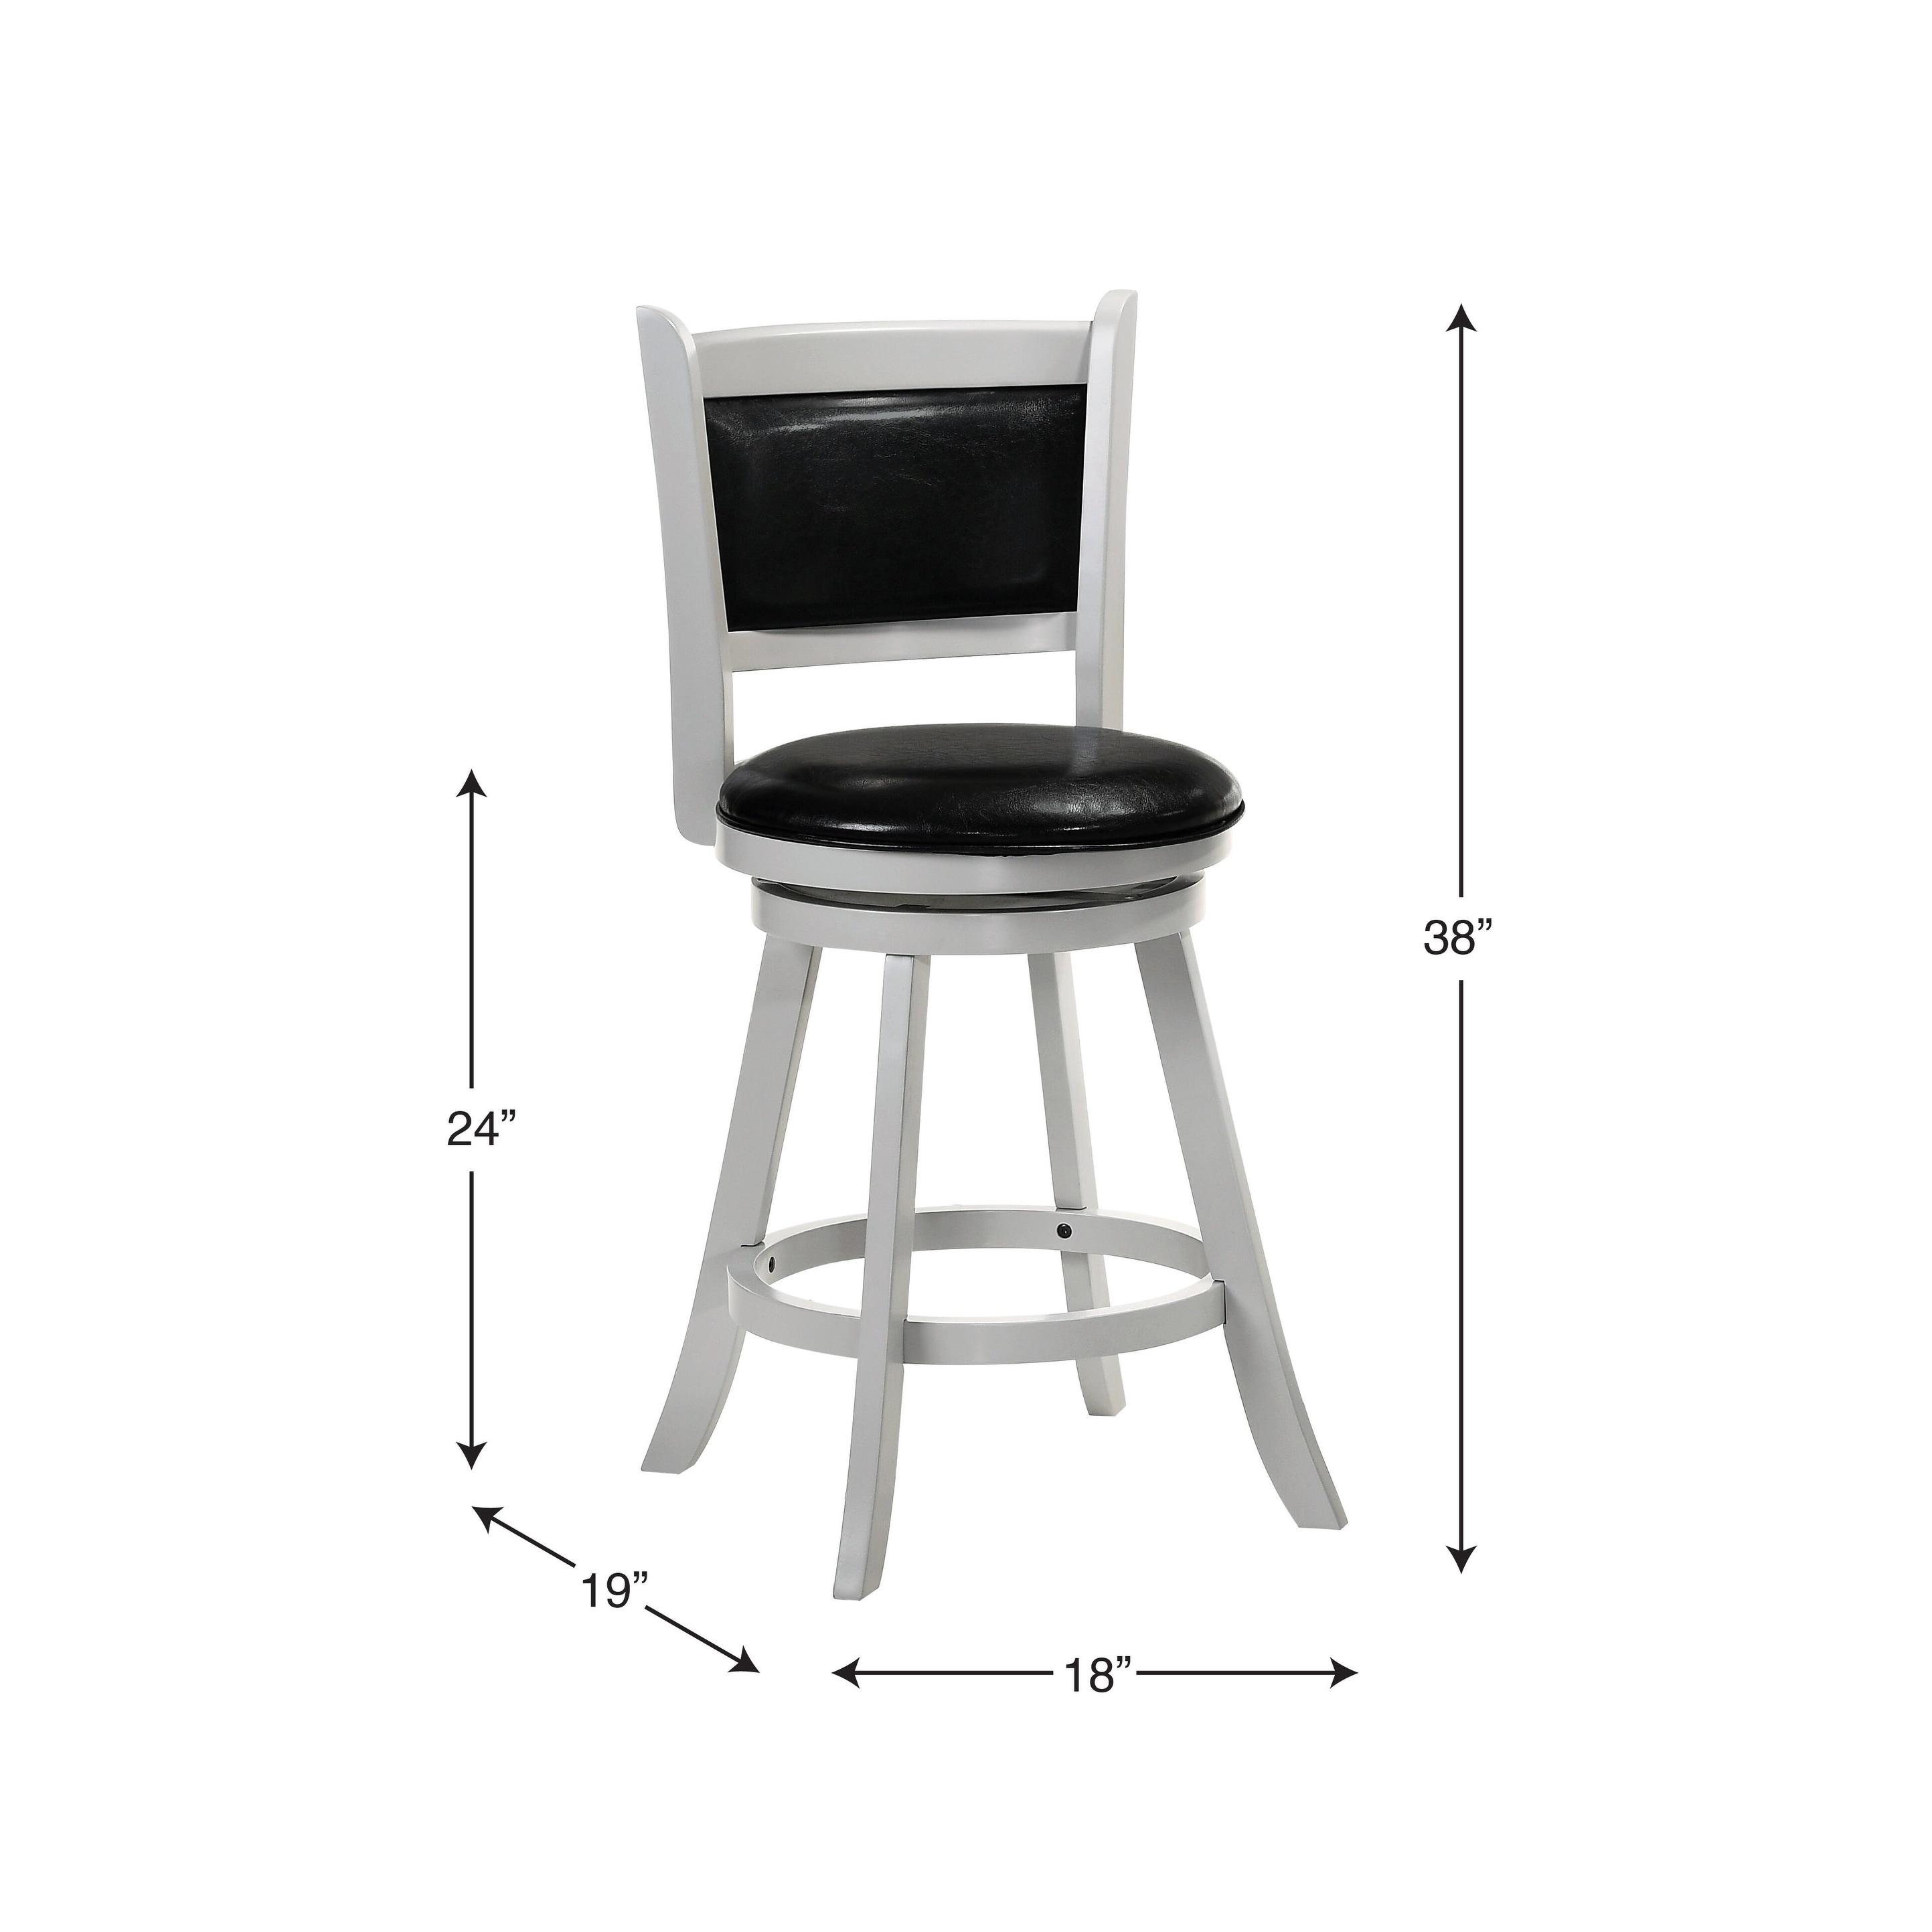 Astounding Charleston 24 Swivel Bar Stool Gray Black Vinyl Theyellowbook Wood Chair Design Ideas Theyellowbookinfo